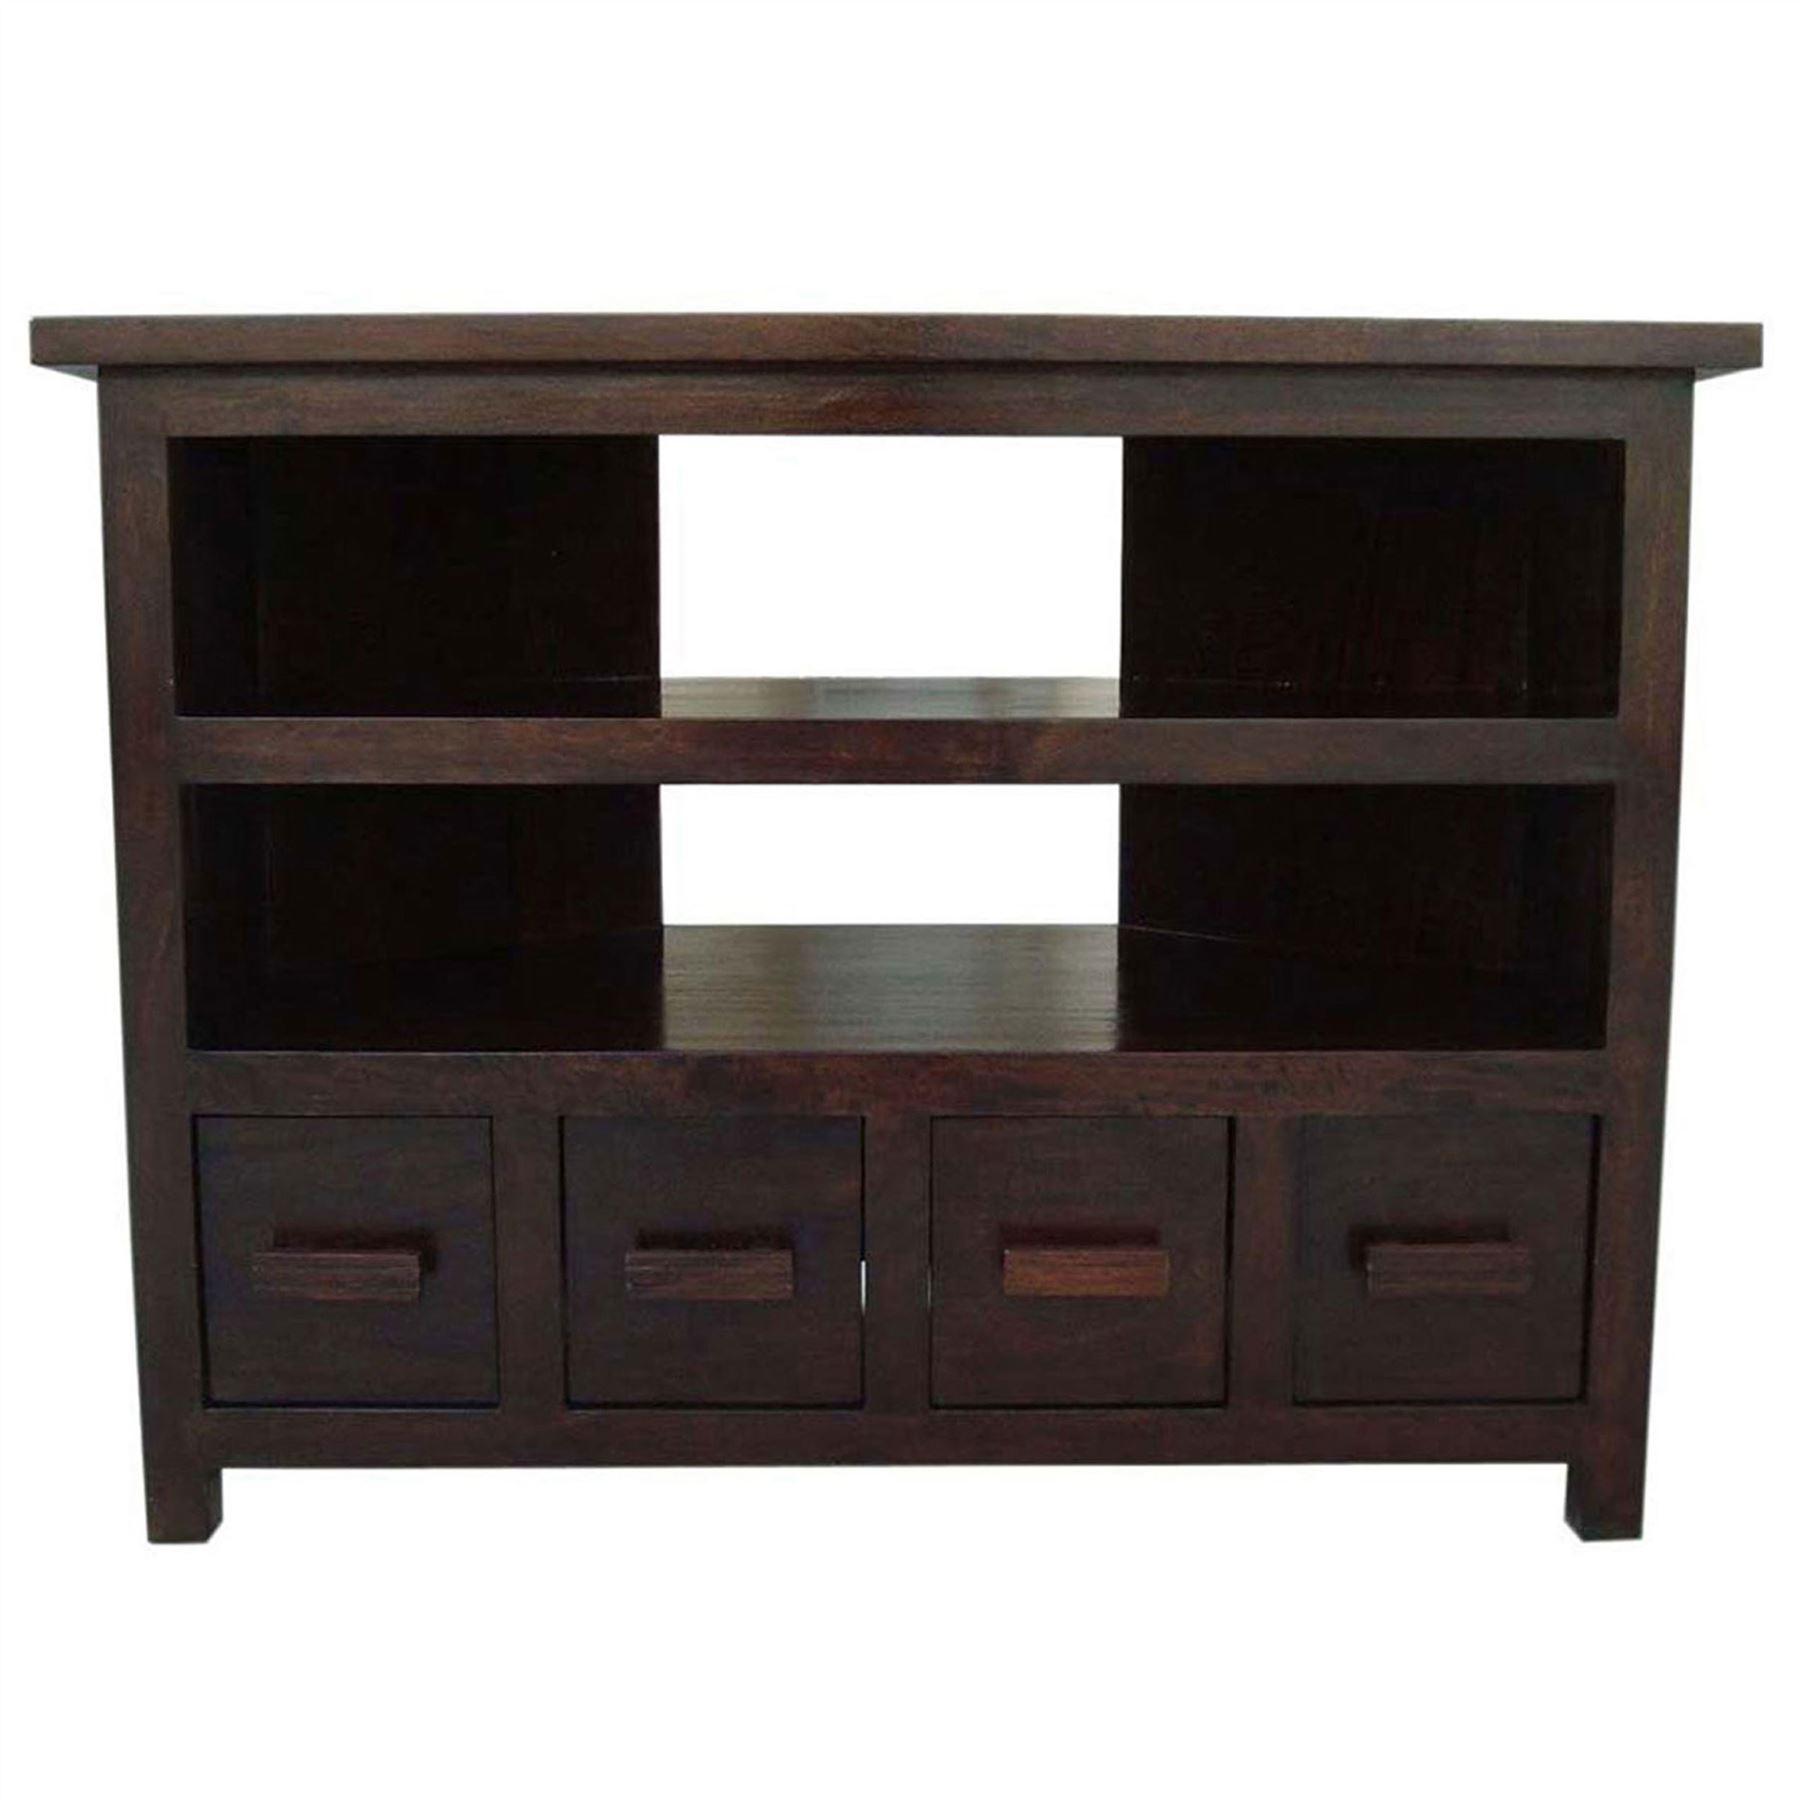 Mangat solid dark wood indian furniture tv unit table for Indian furniture